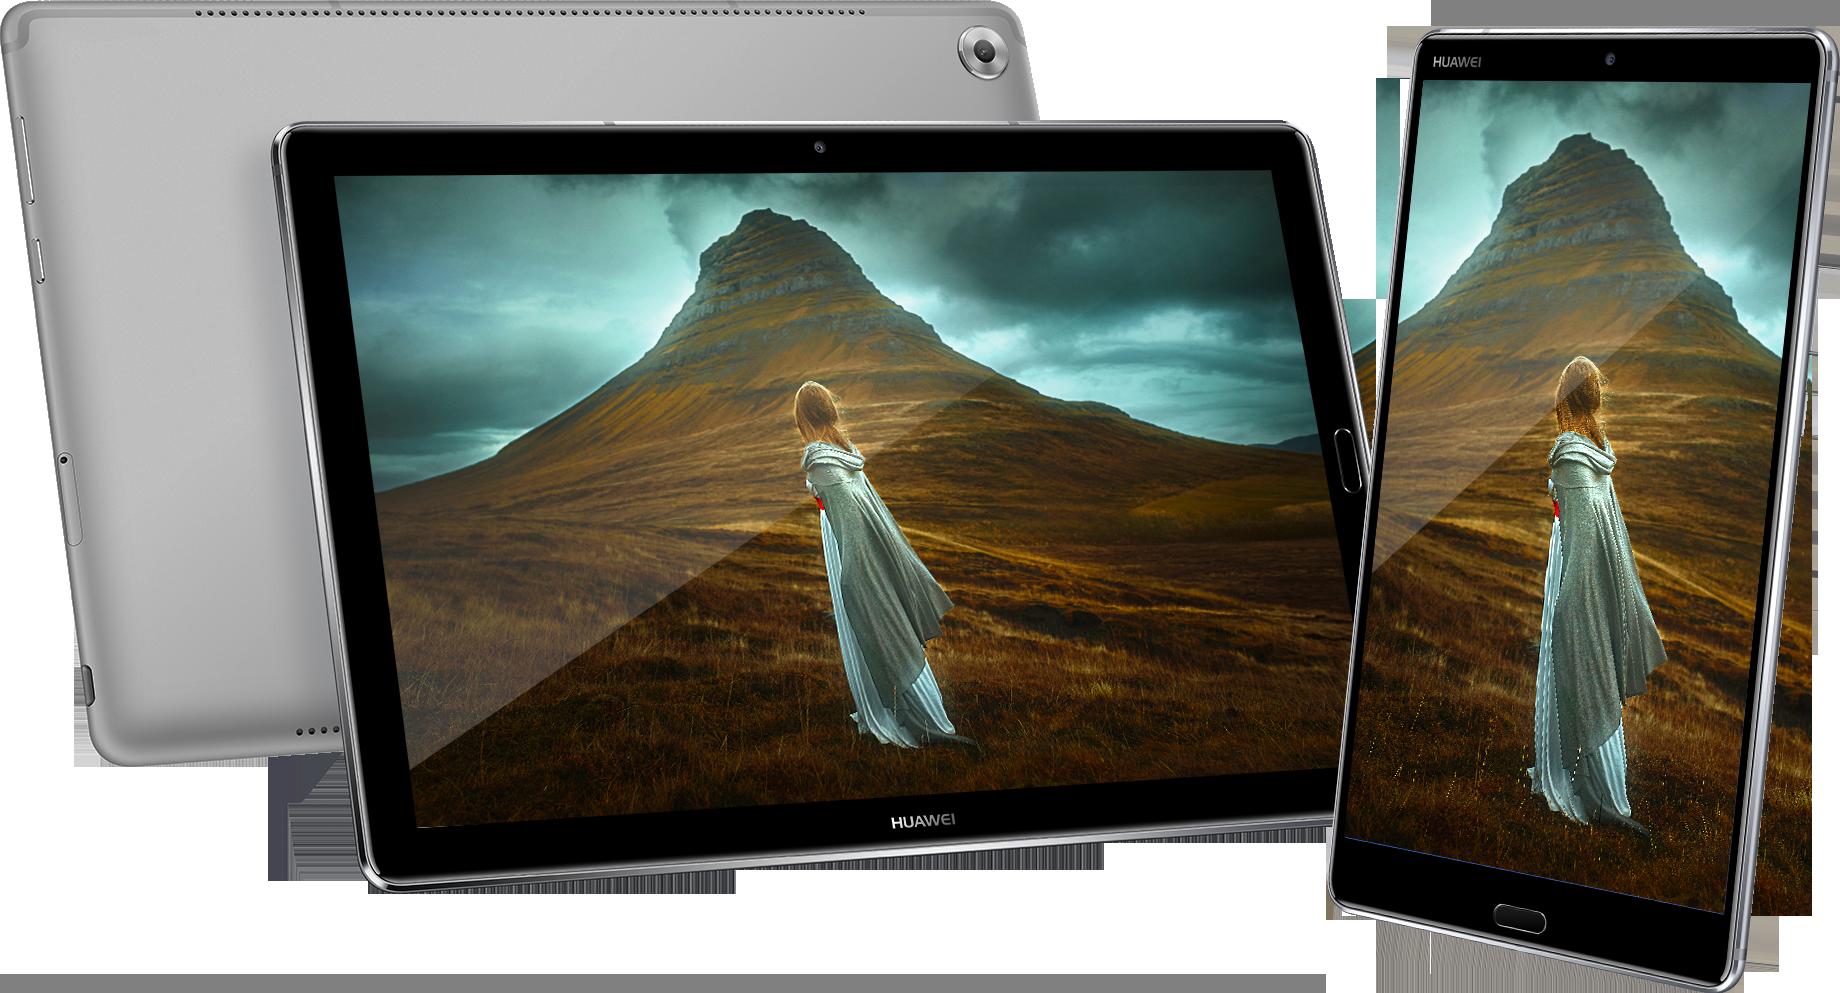 The Huawei MediaPad M5 Range